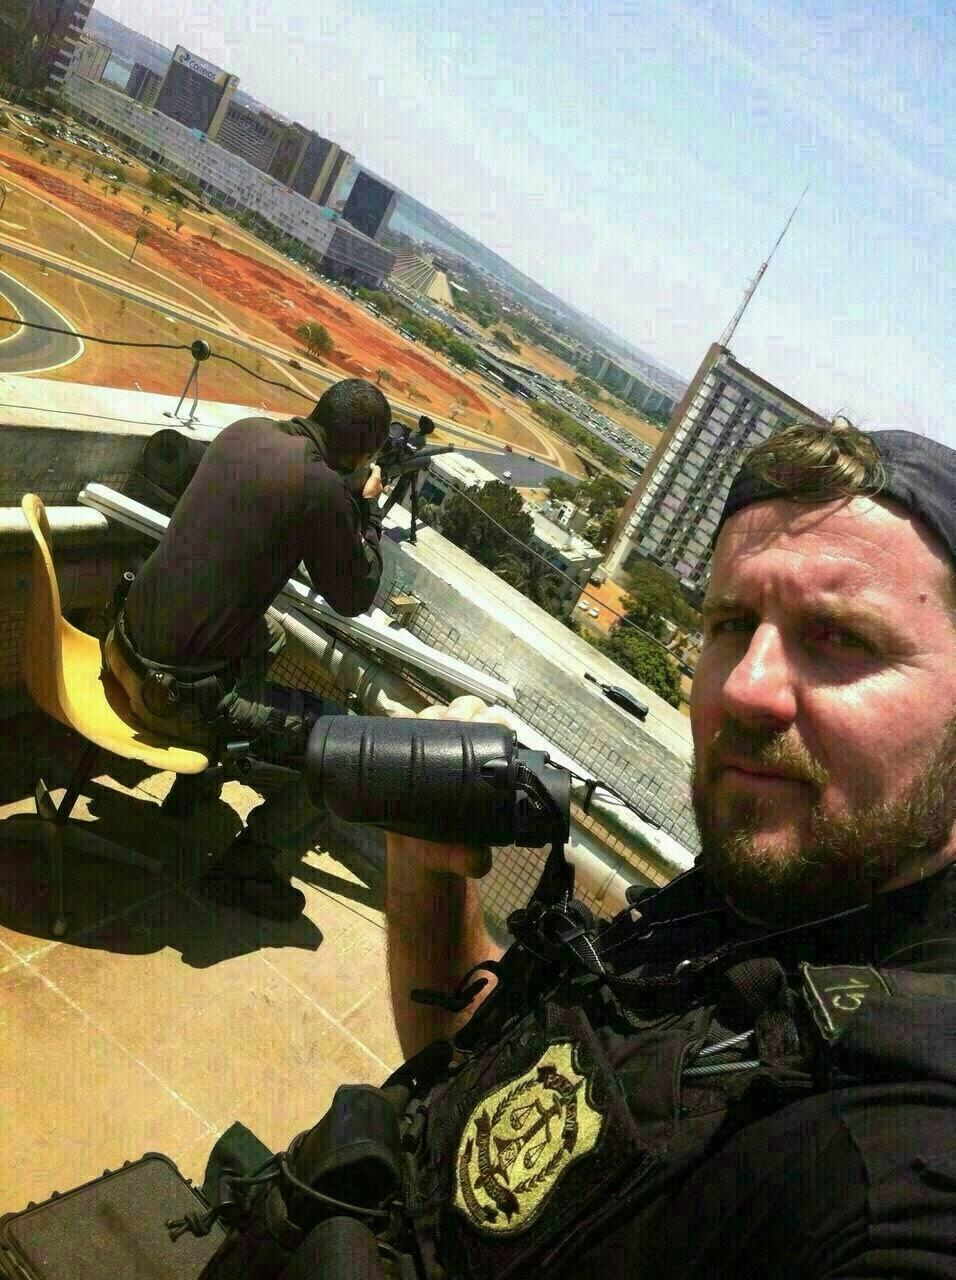 Porcket Hobby - www.pockethobby.com - #Hobby News 9 - Selfie - Policial Civil -